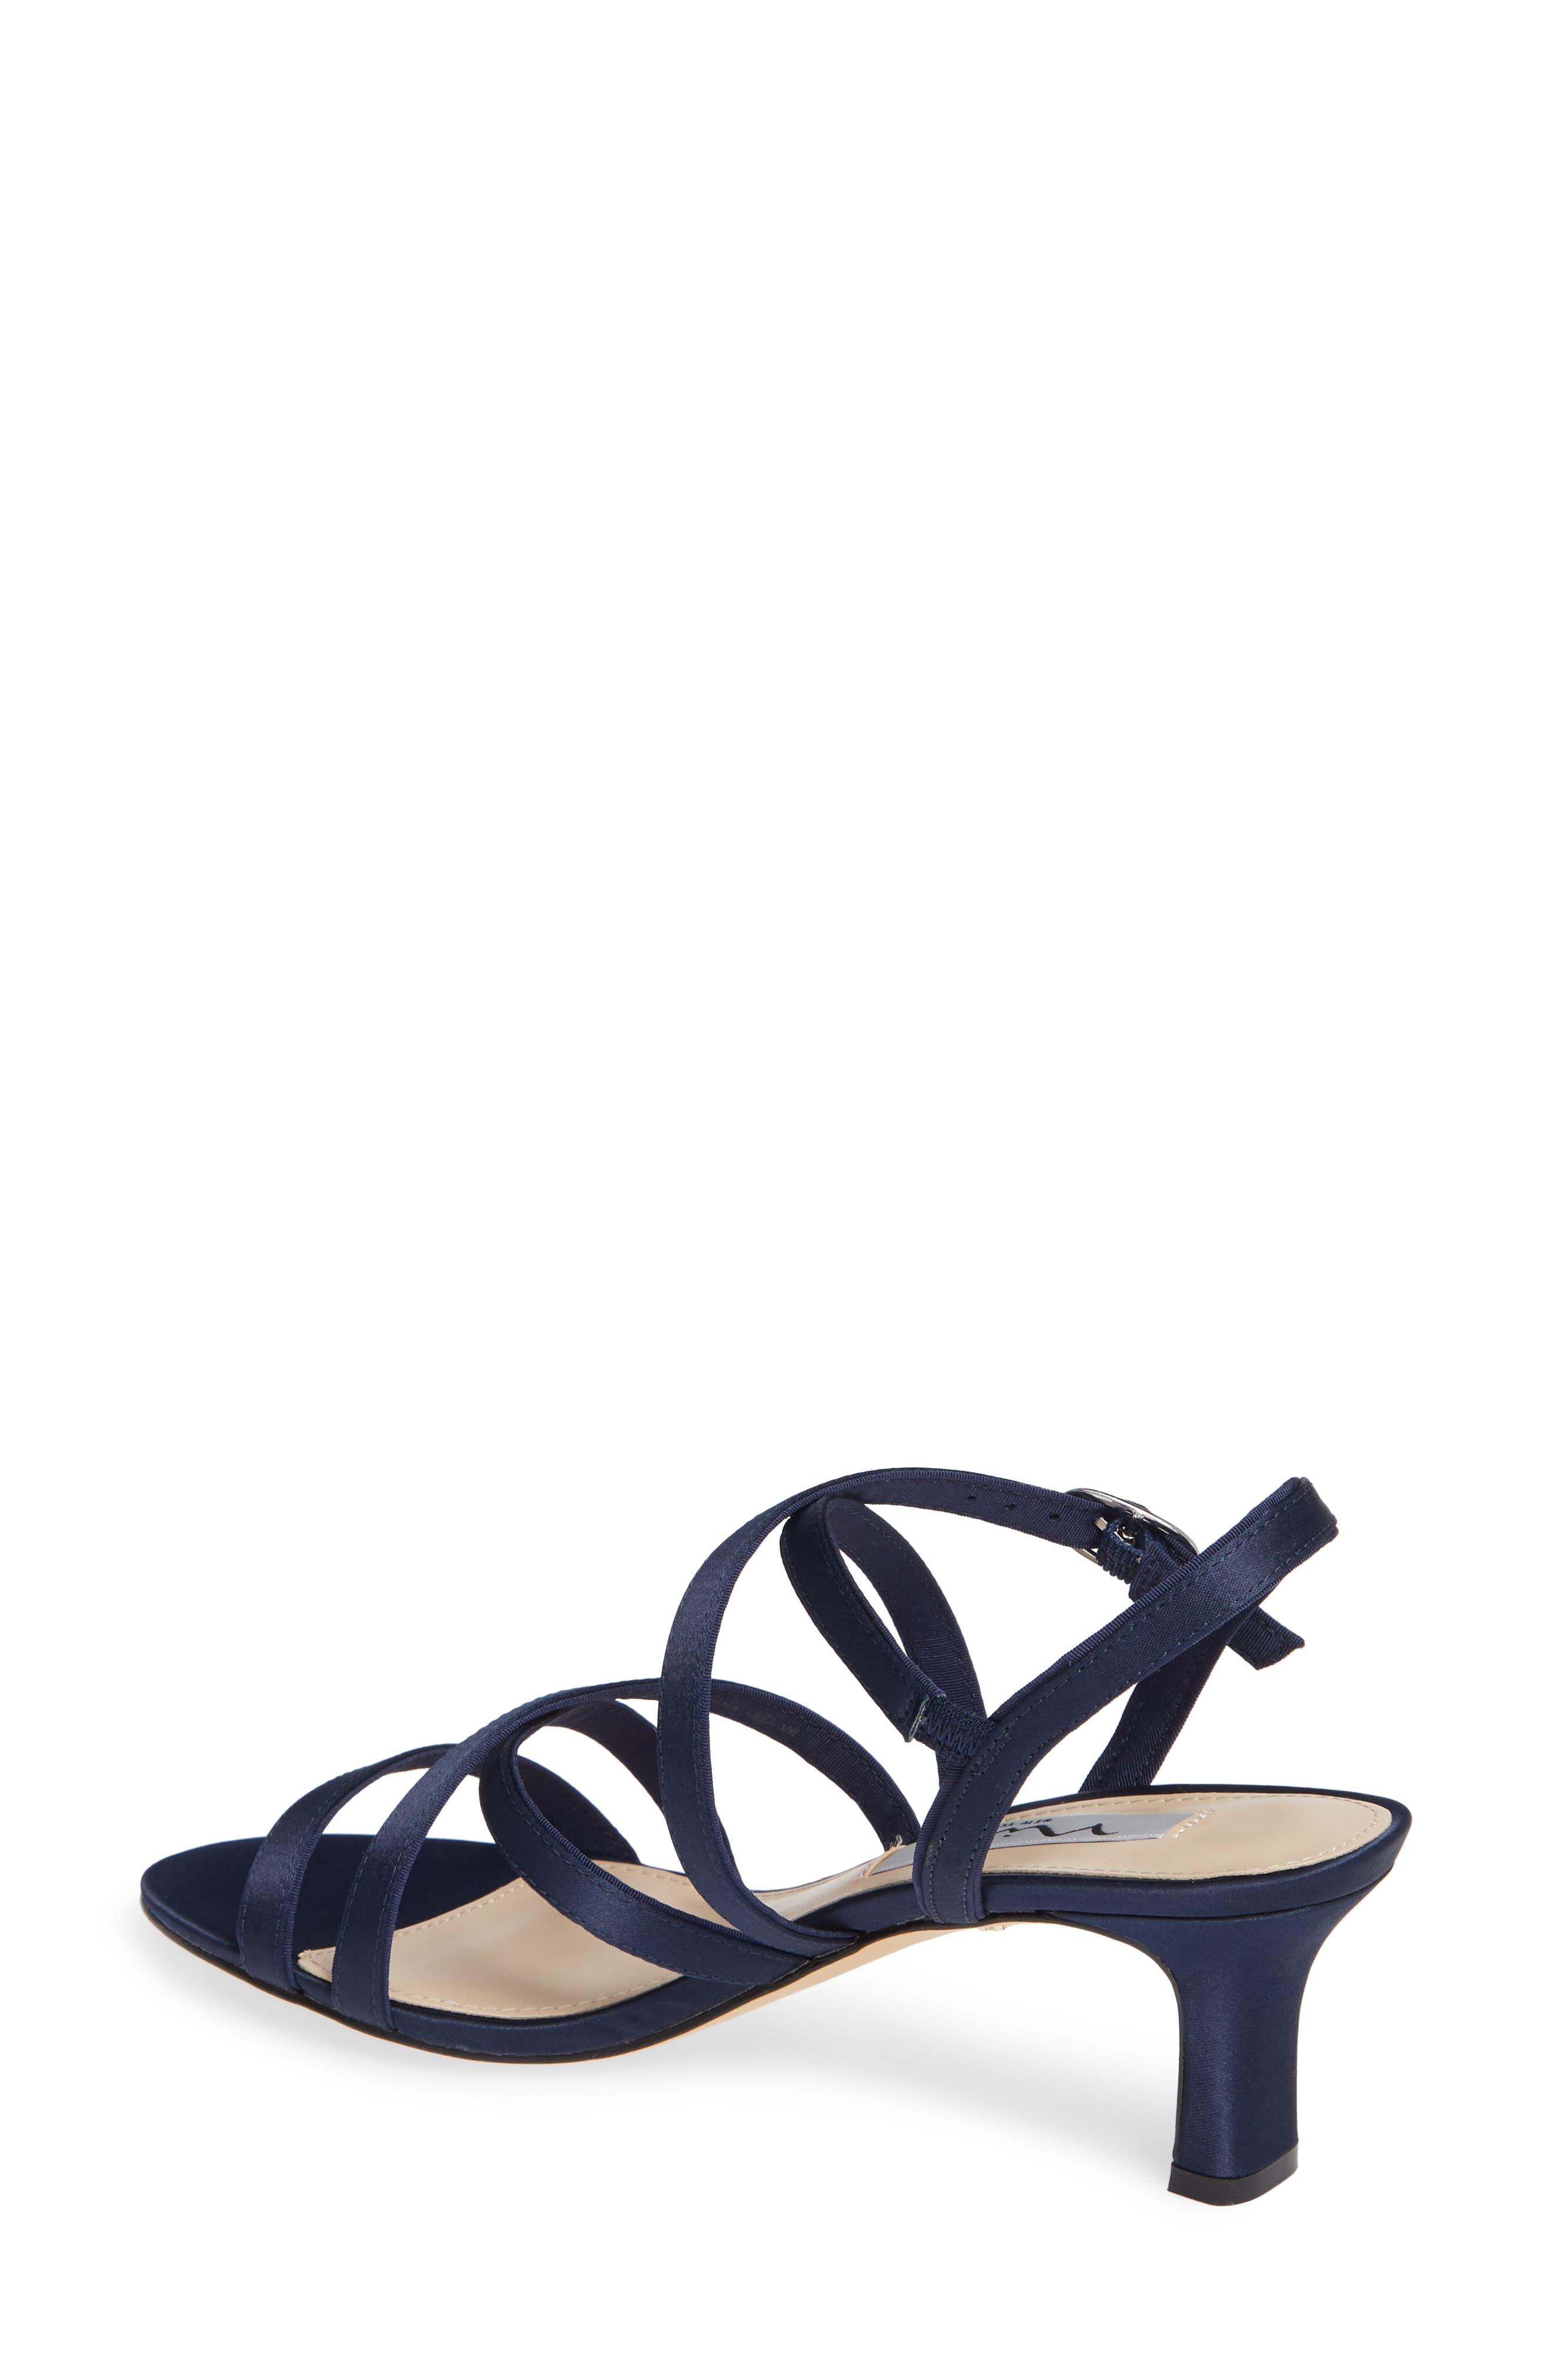 Genaya Strappy Evening Sandal,                             Alternate thumbnail 2, color,                             Navy Satin